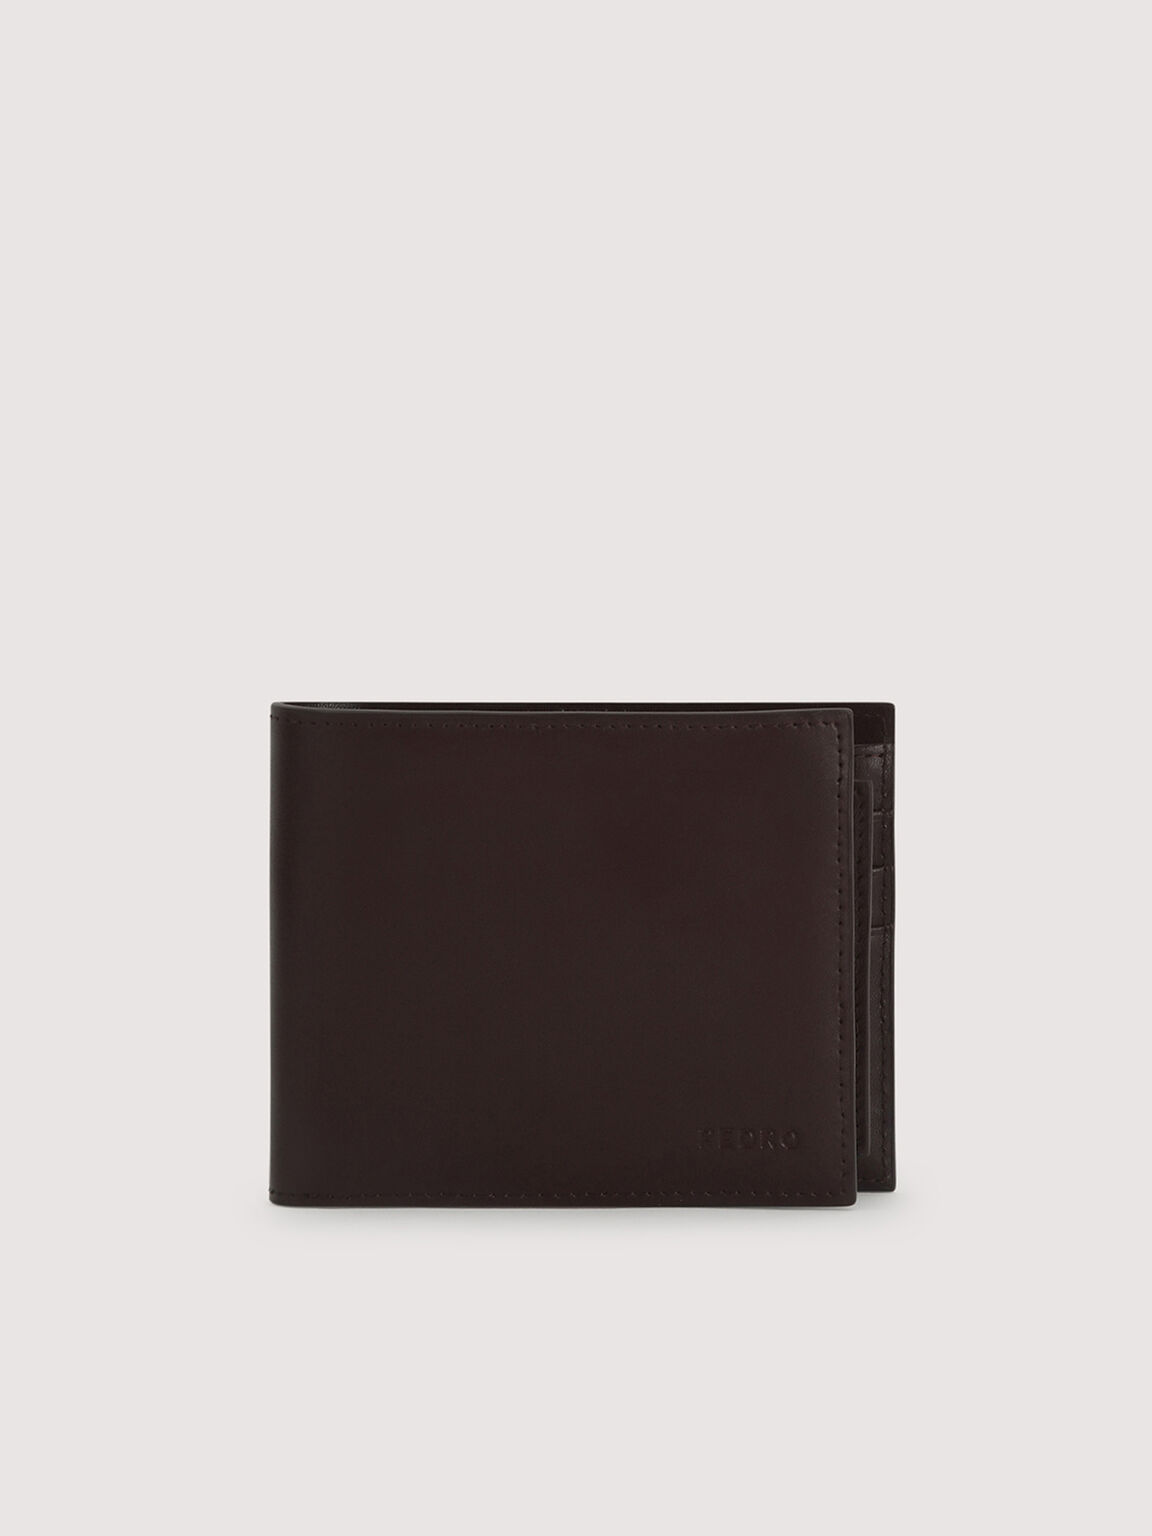 Leather Bi-Fold with Insert, Dark Brown, hi-res